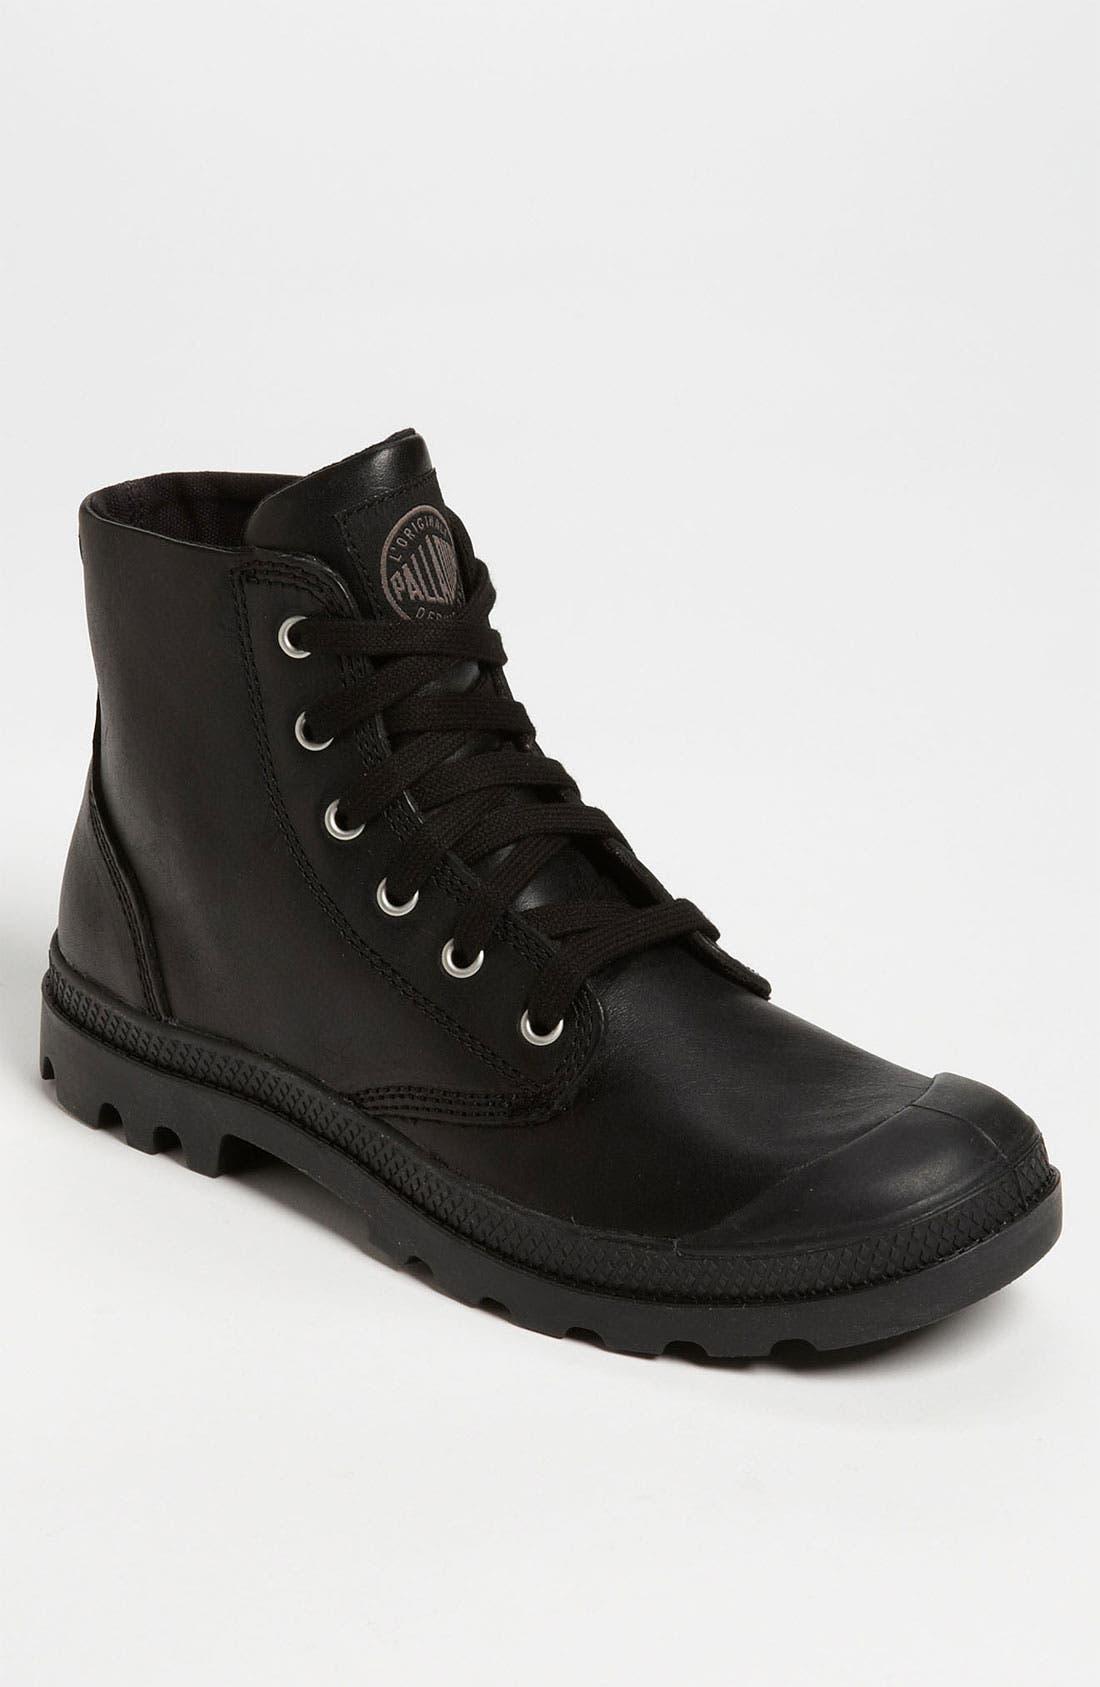 Alternate Image 1 Selected - Palladium 'Pampa Hi' Leather Boot